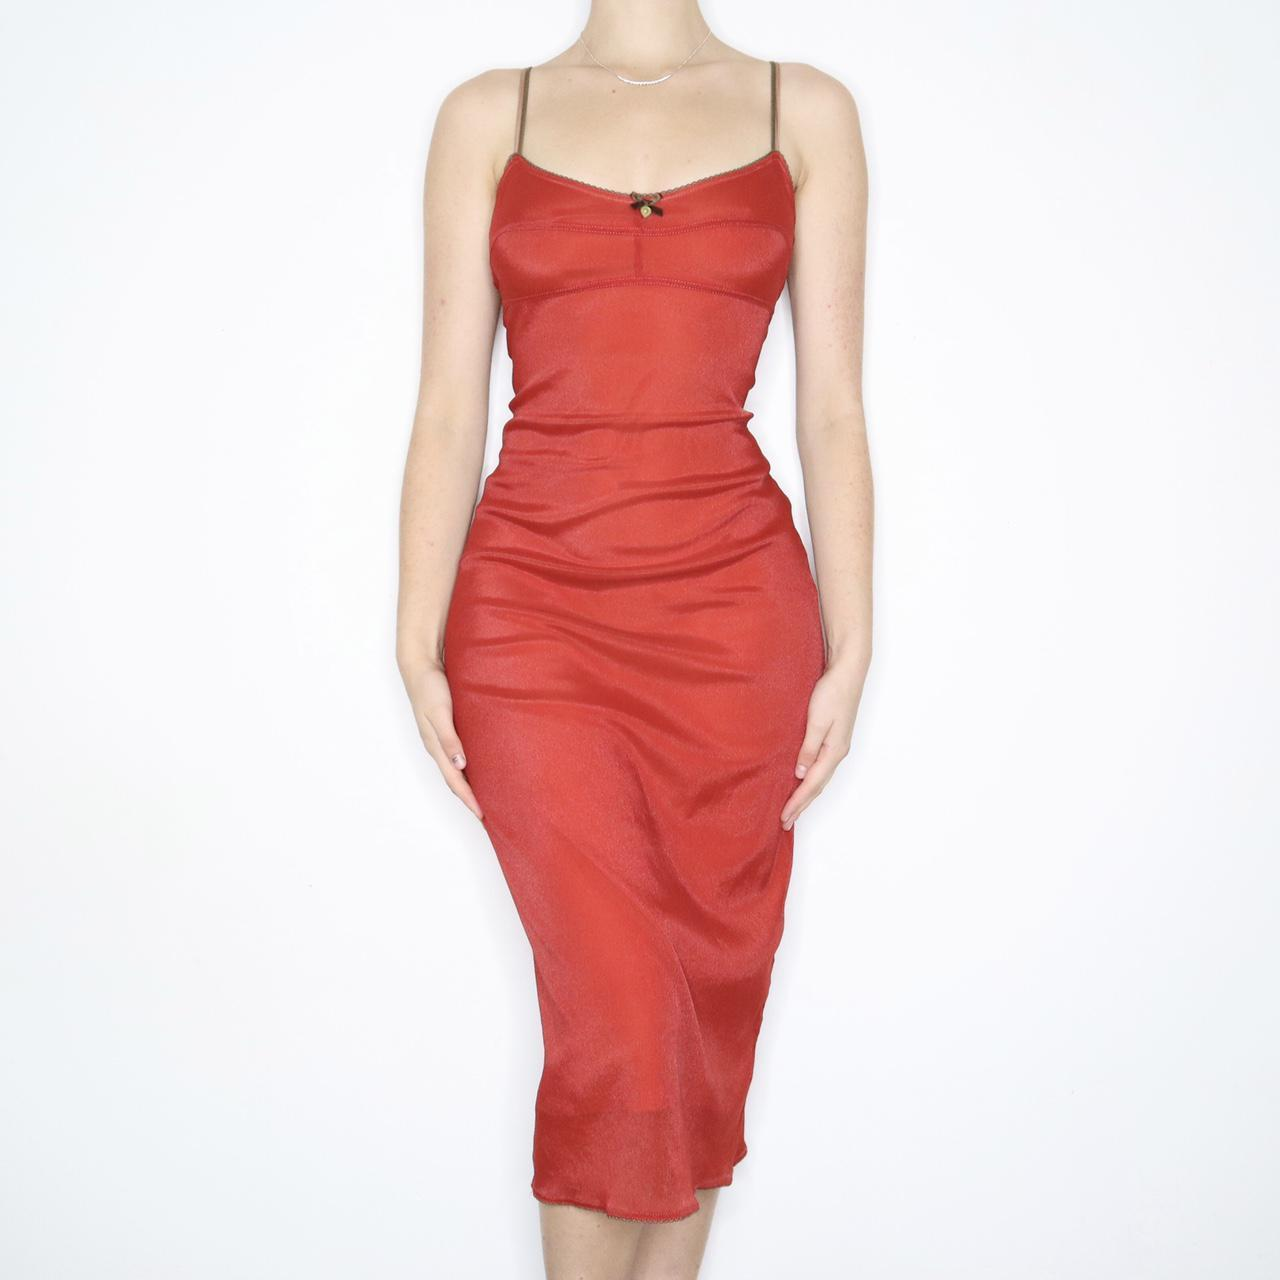 Product Image 1 - Vintage Y2K Kookai Orange Red